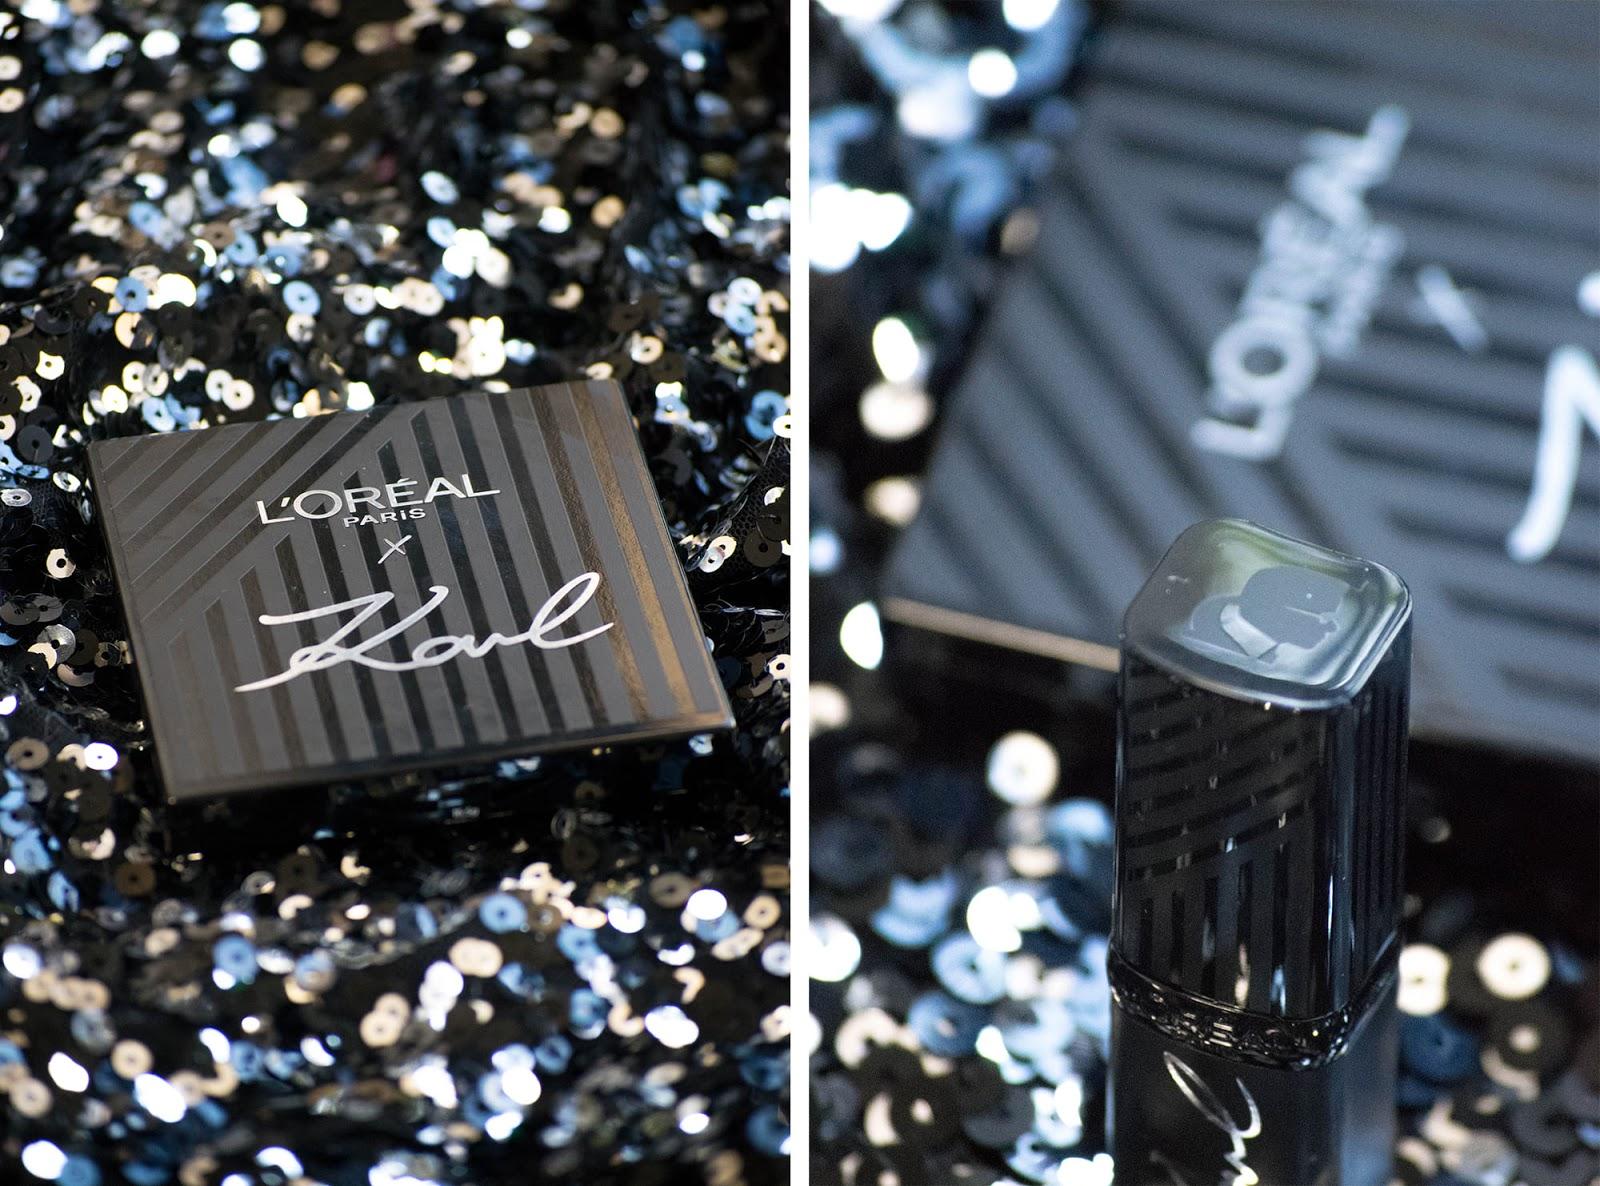 Karl Lagerfeld x L'Óreal Paris packaging